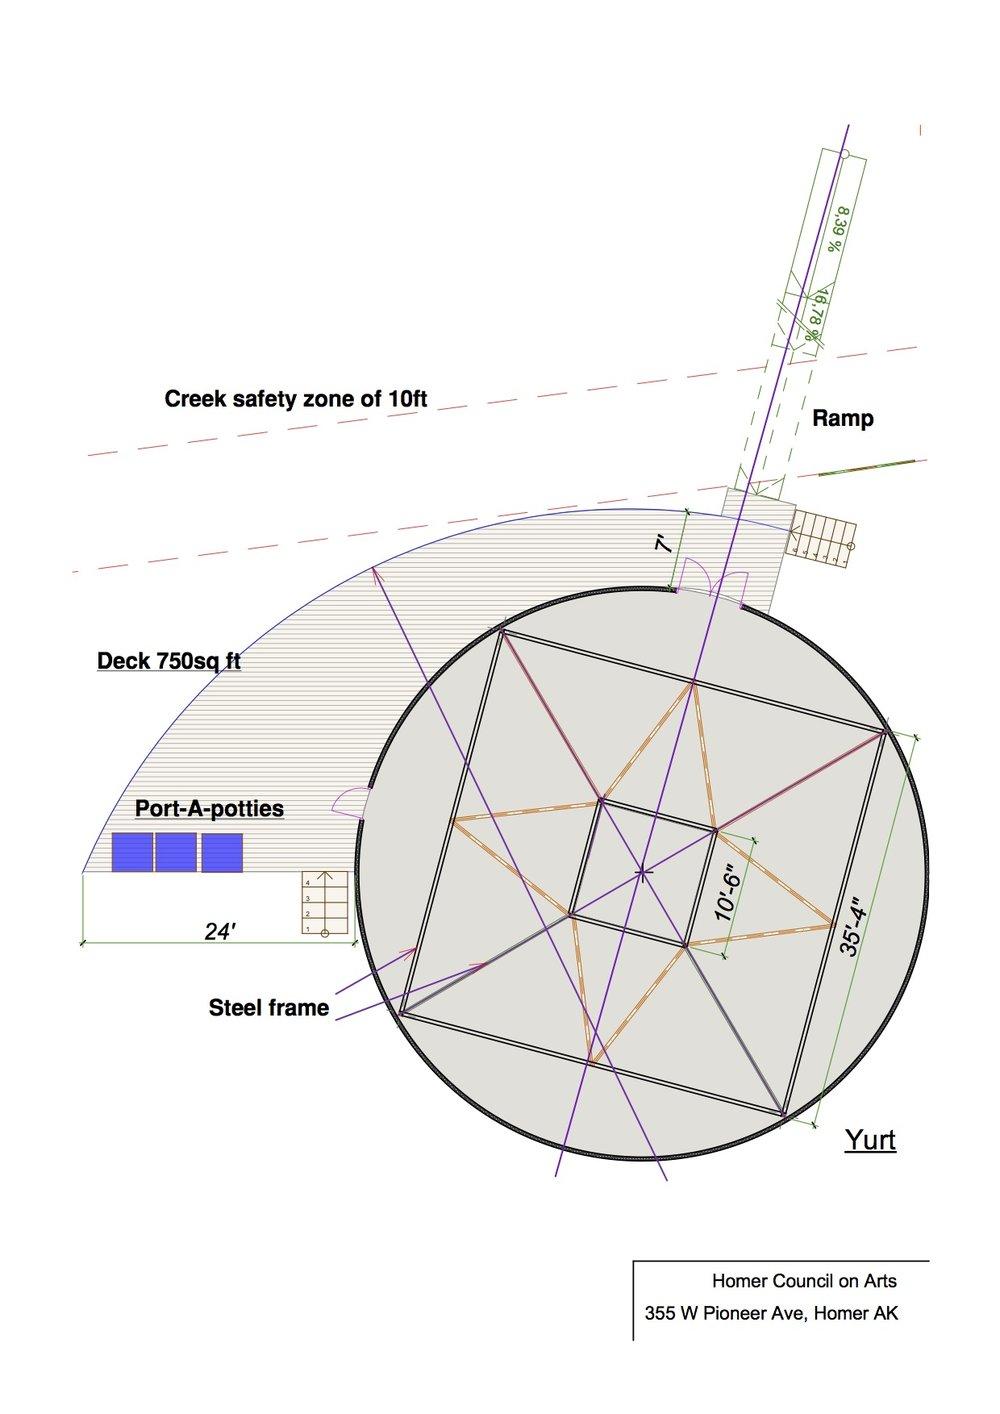 HCOA-Layout 36 x 24 (1).jpg